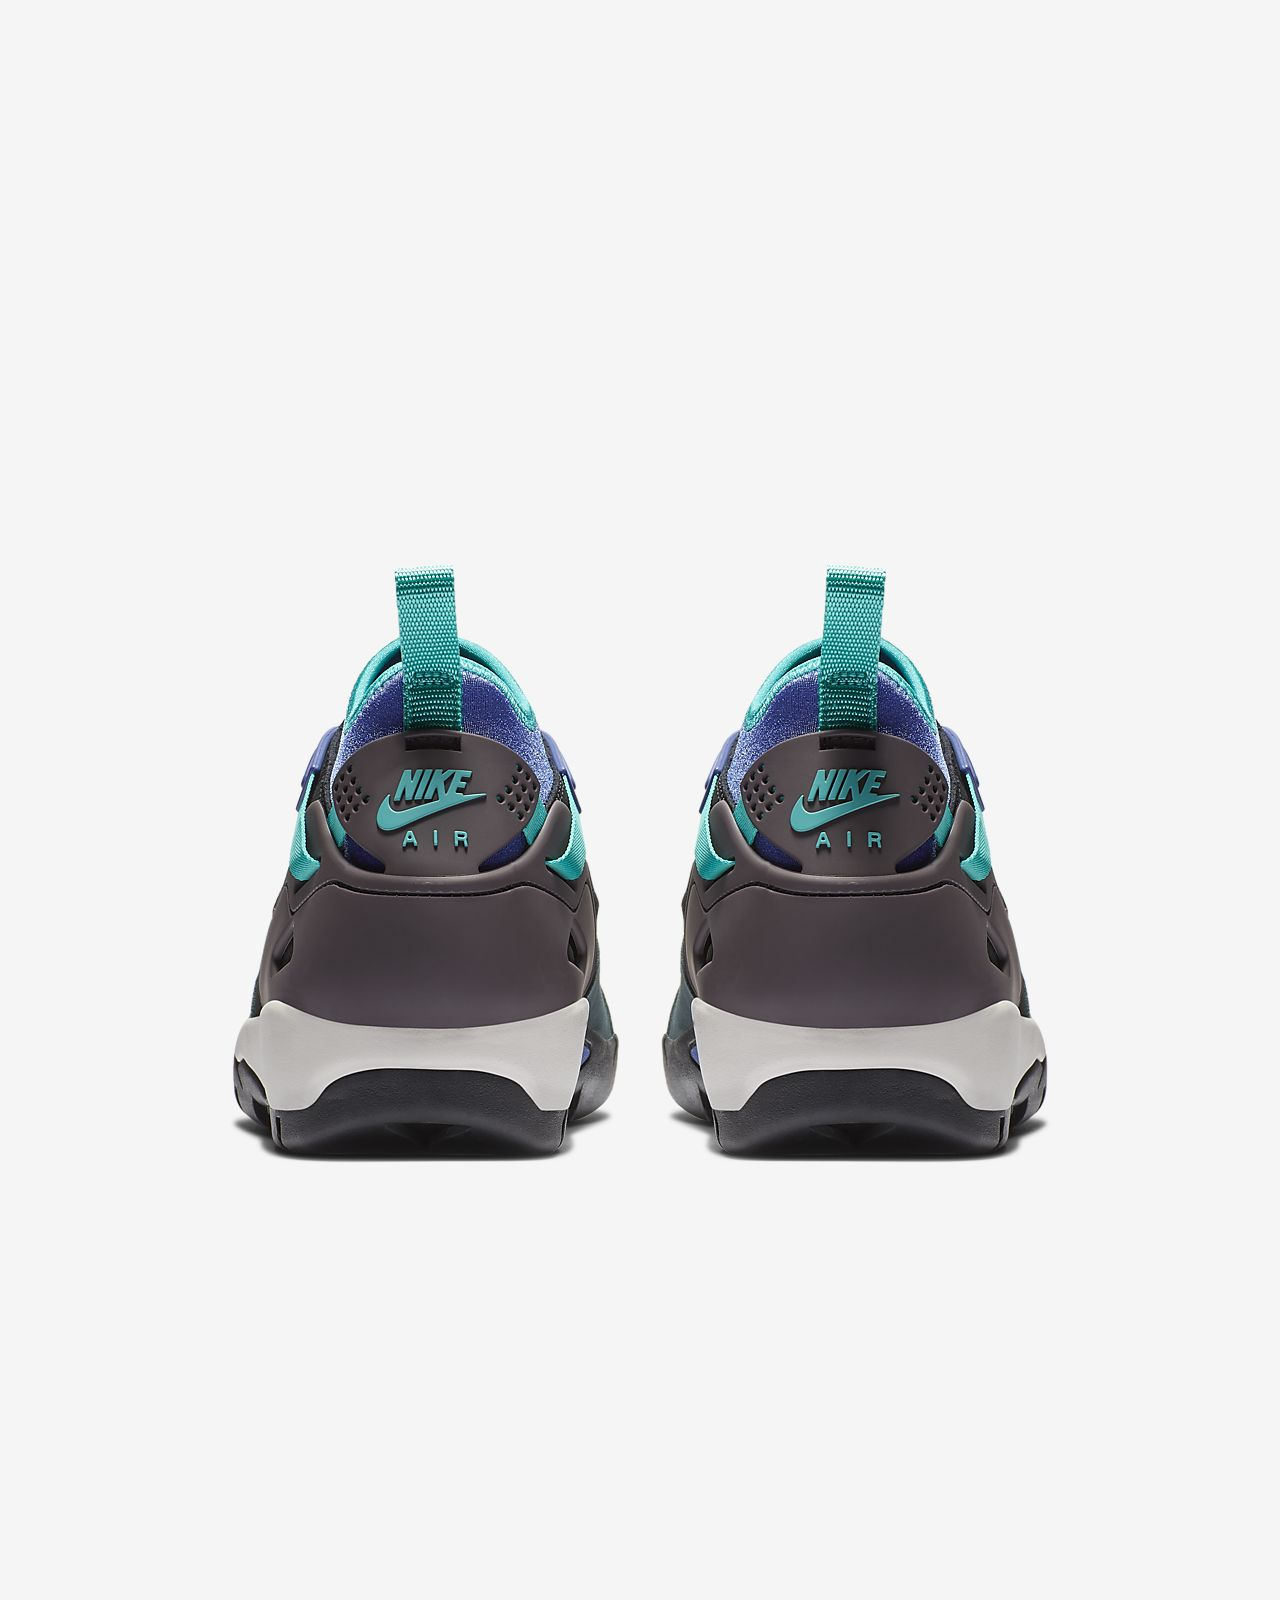 98fccef58f4b Nike ACG Air Revaderchi Men s Shoe. Nike.com SG